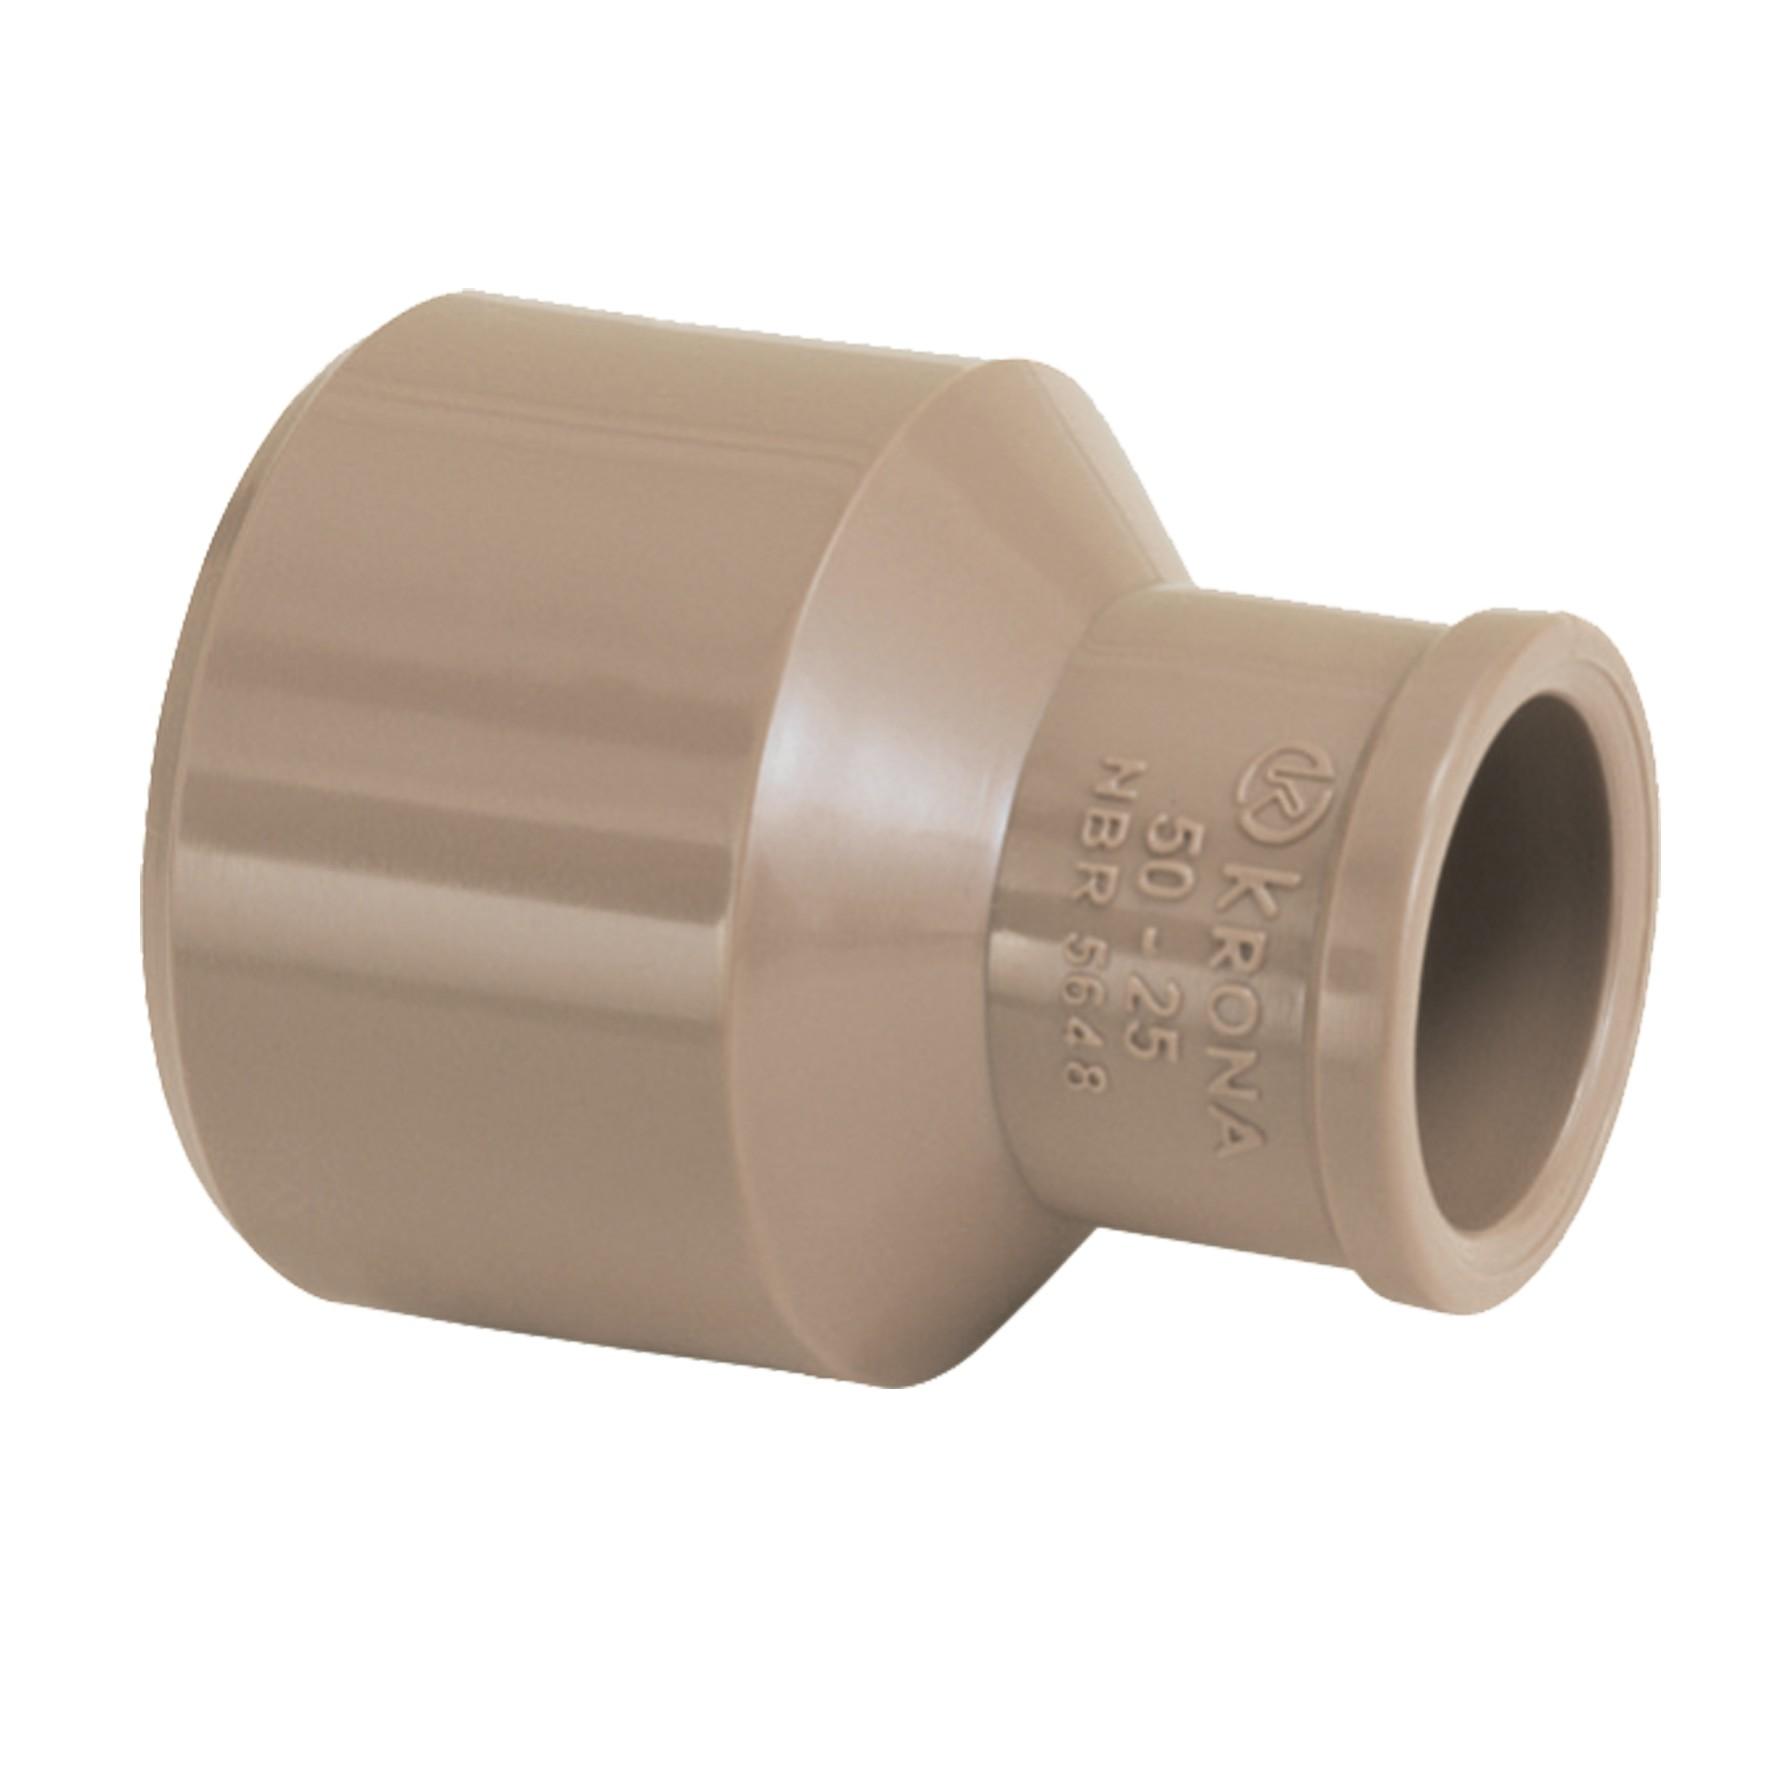 Bucha Longa Simples Soldavel de PVC 60mm 376 - Krona